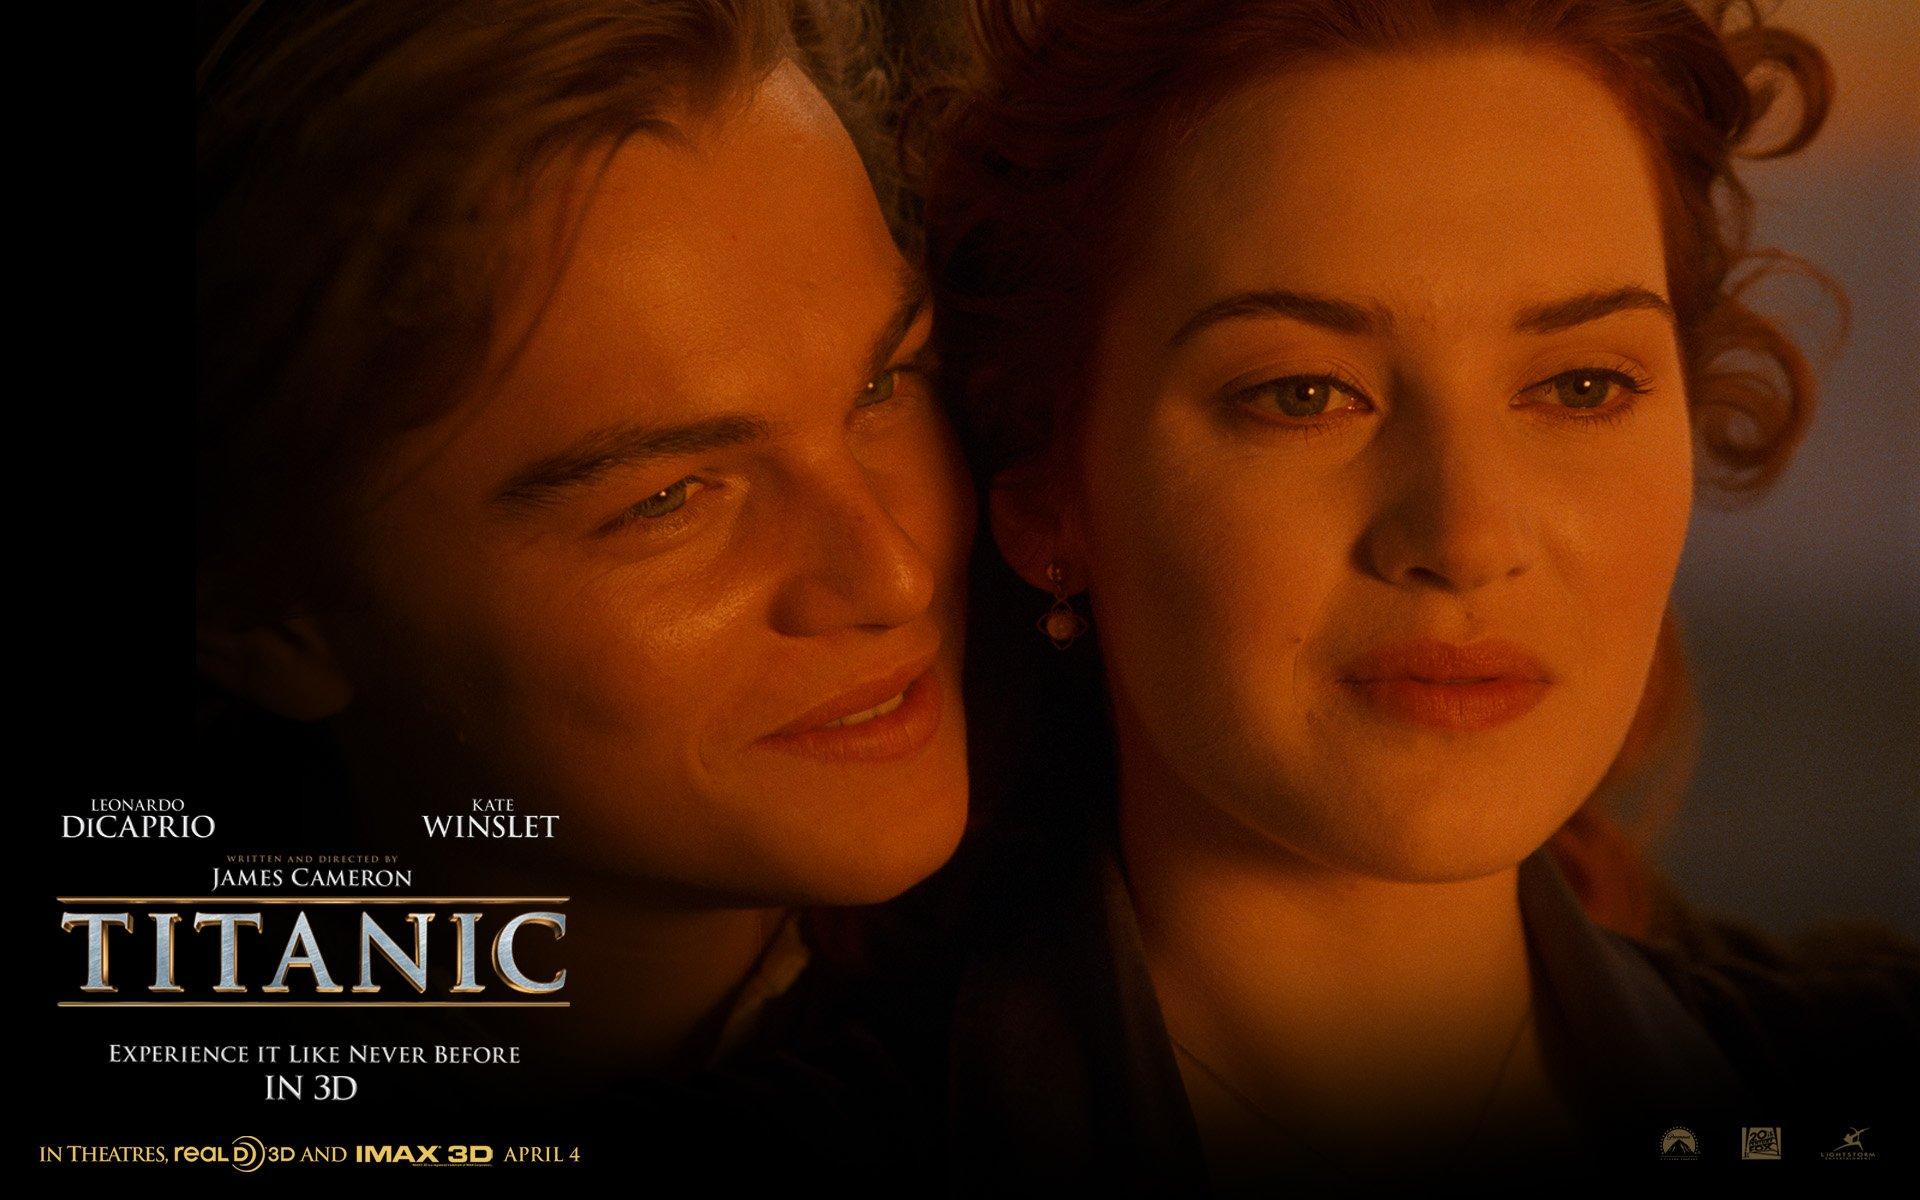 Titanic Titanic 3D Movie Walpapers 1920x1200